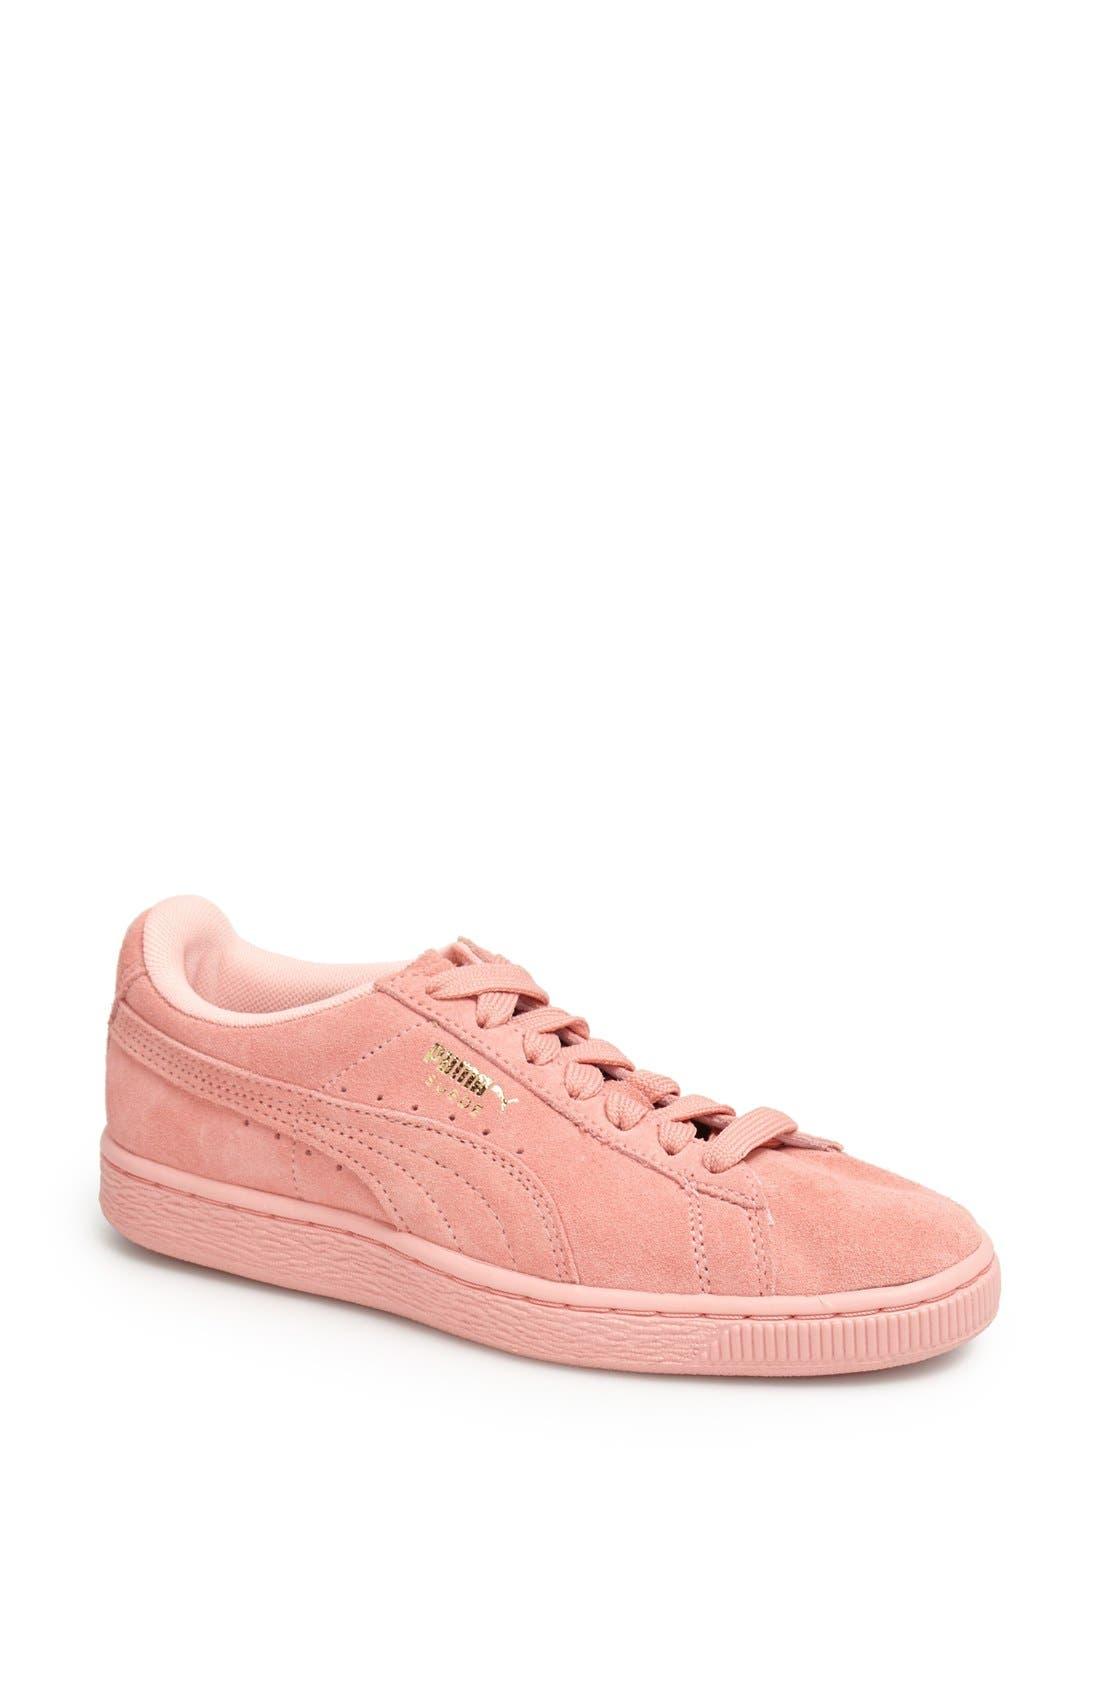 Main Image - PUMA Suede Sneaker (Women)